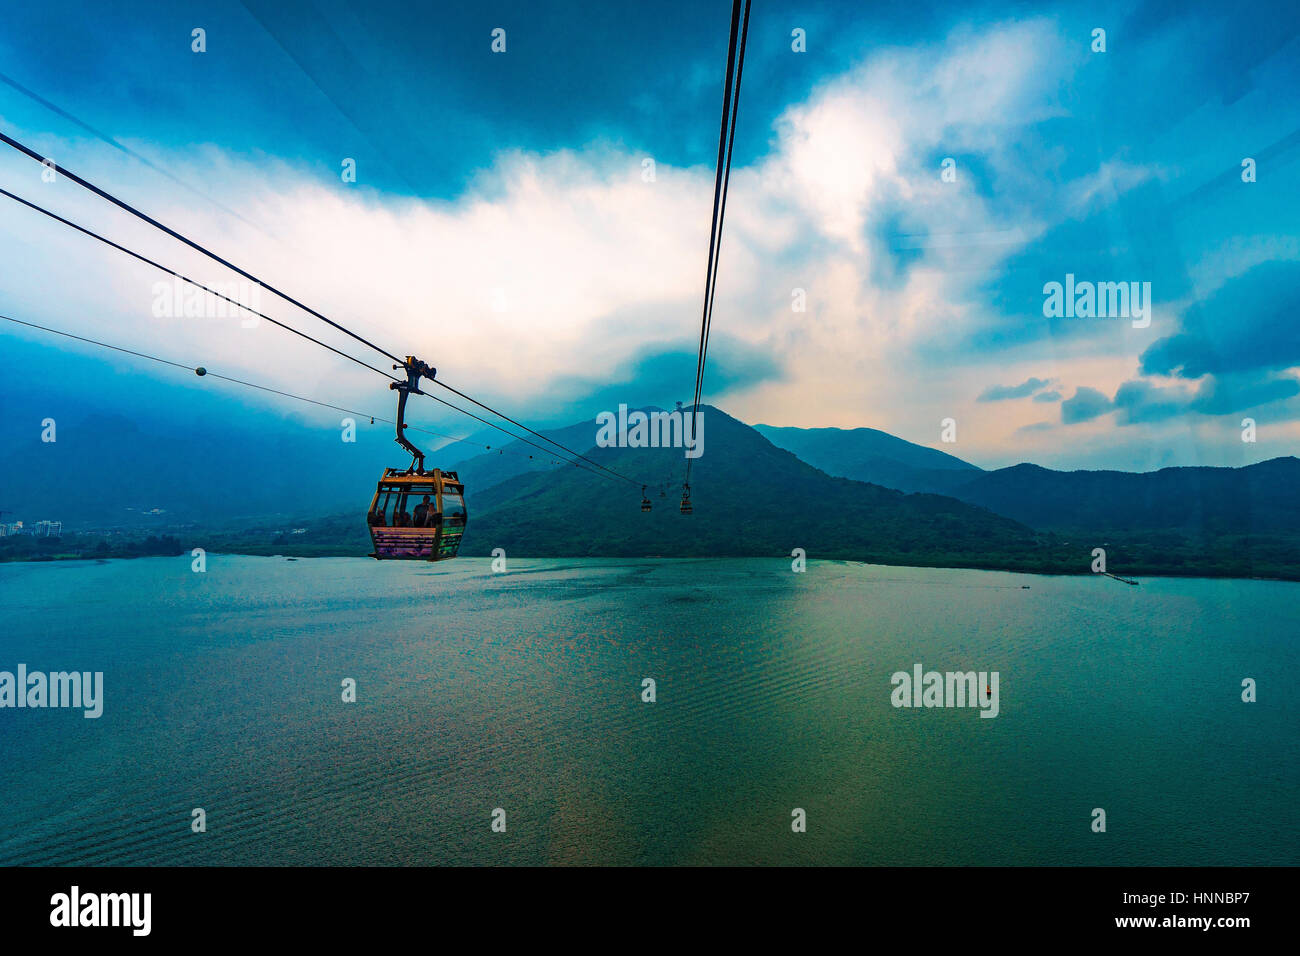 Hongkong Da Yu Shan cable car - Stock Image